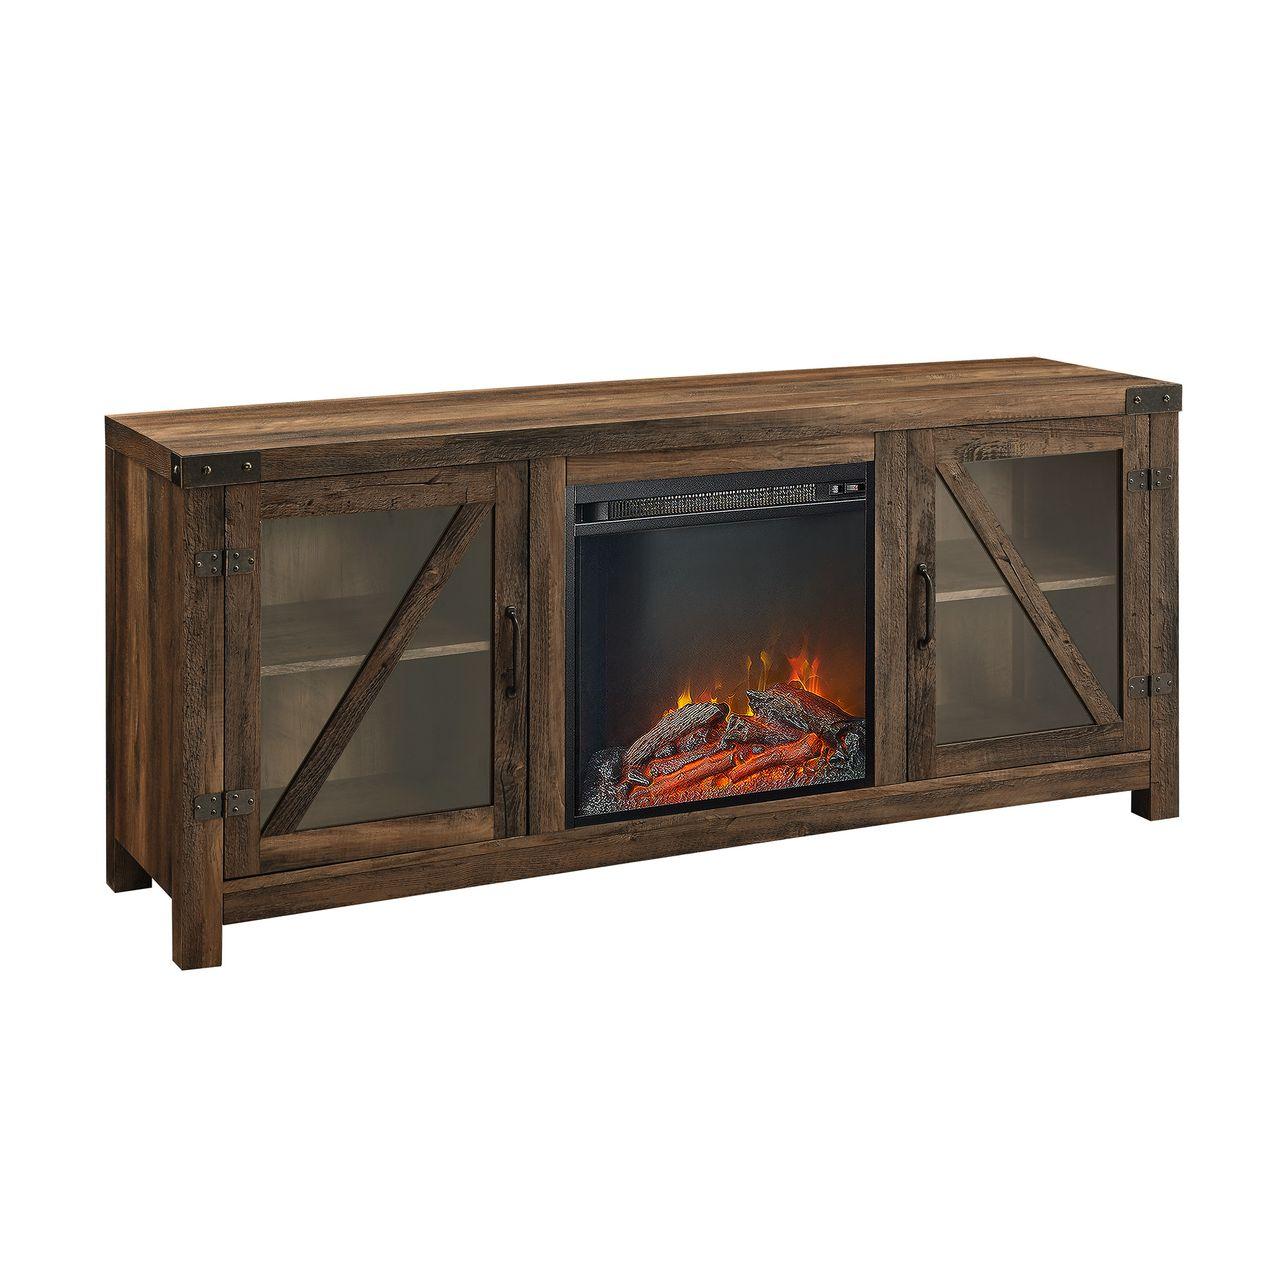 "Walker Edison 58"" Glass Barn Door Fireplace Console - Barnwood"